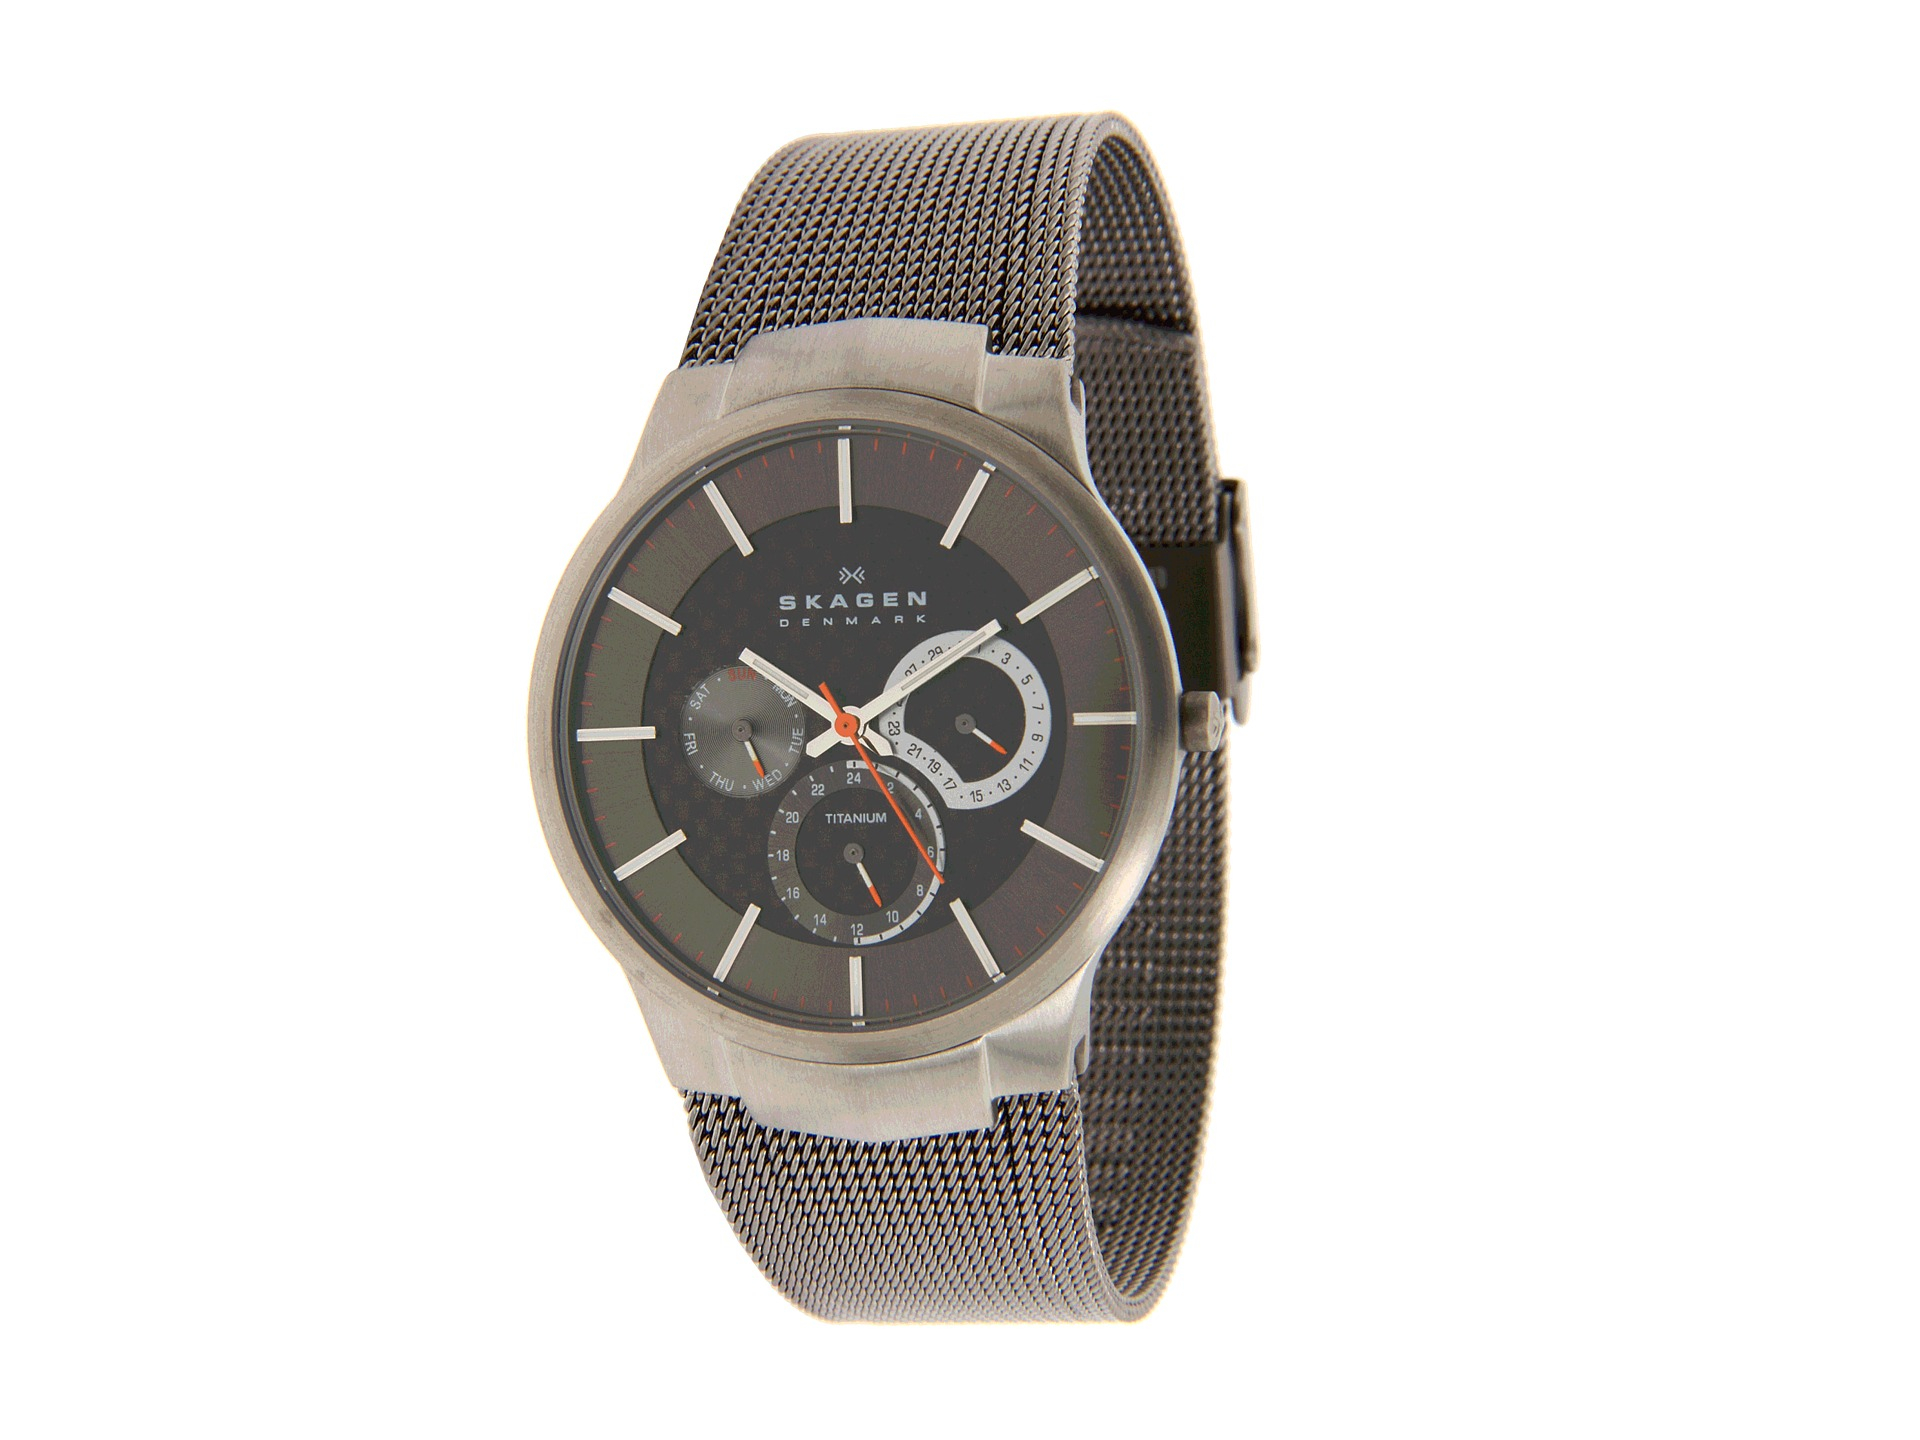 Carbon Fiber Iphone Case >> Skagen 809Xlttm Carbon Fiber Dial Titanium Watch in Gray for Men   Lyst